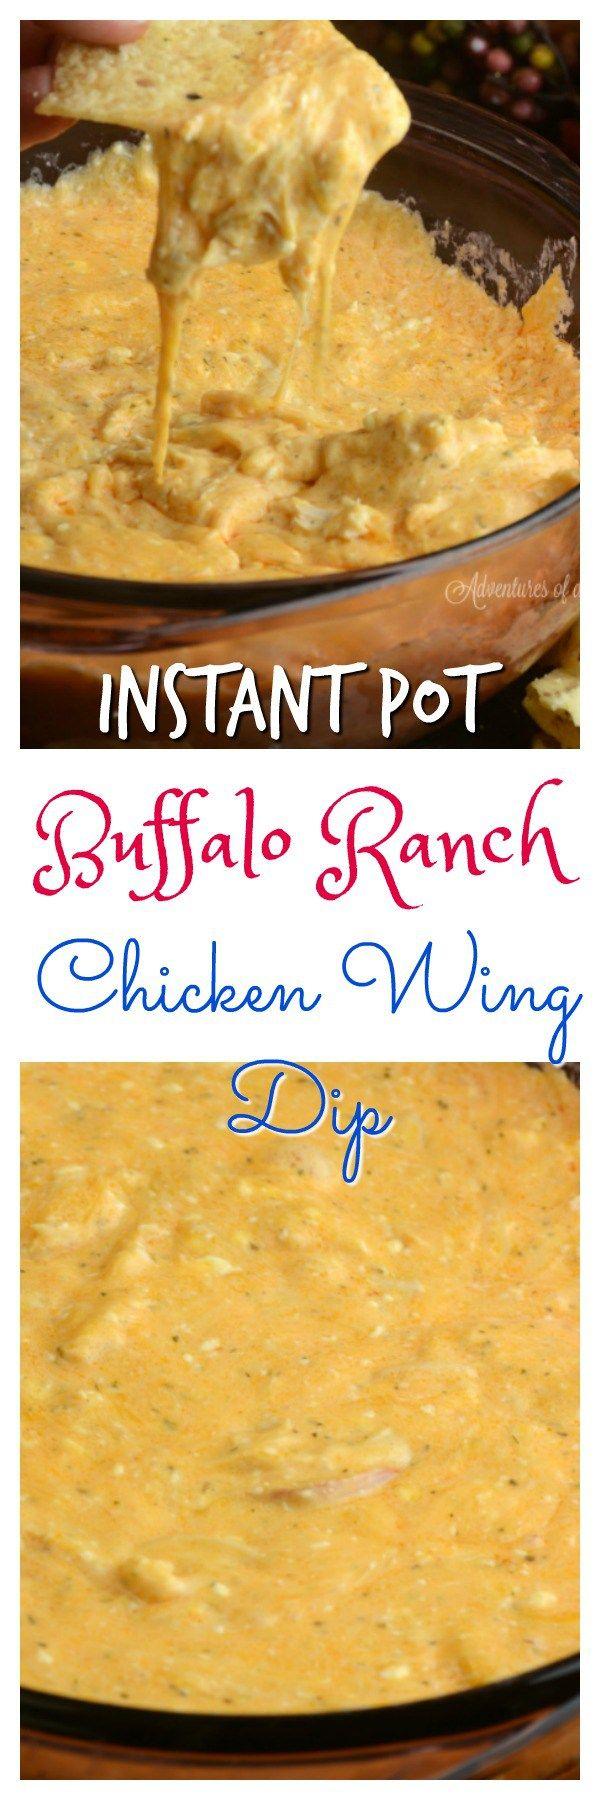 buffalo-ranch-chicken-wing-dip